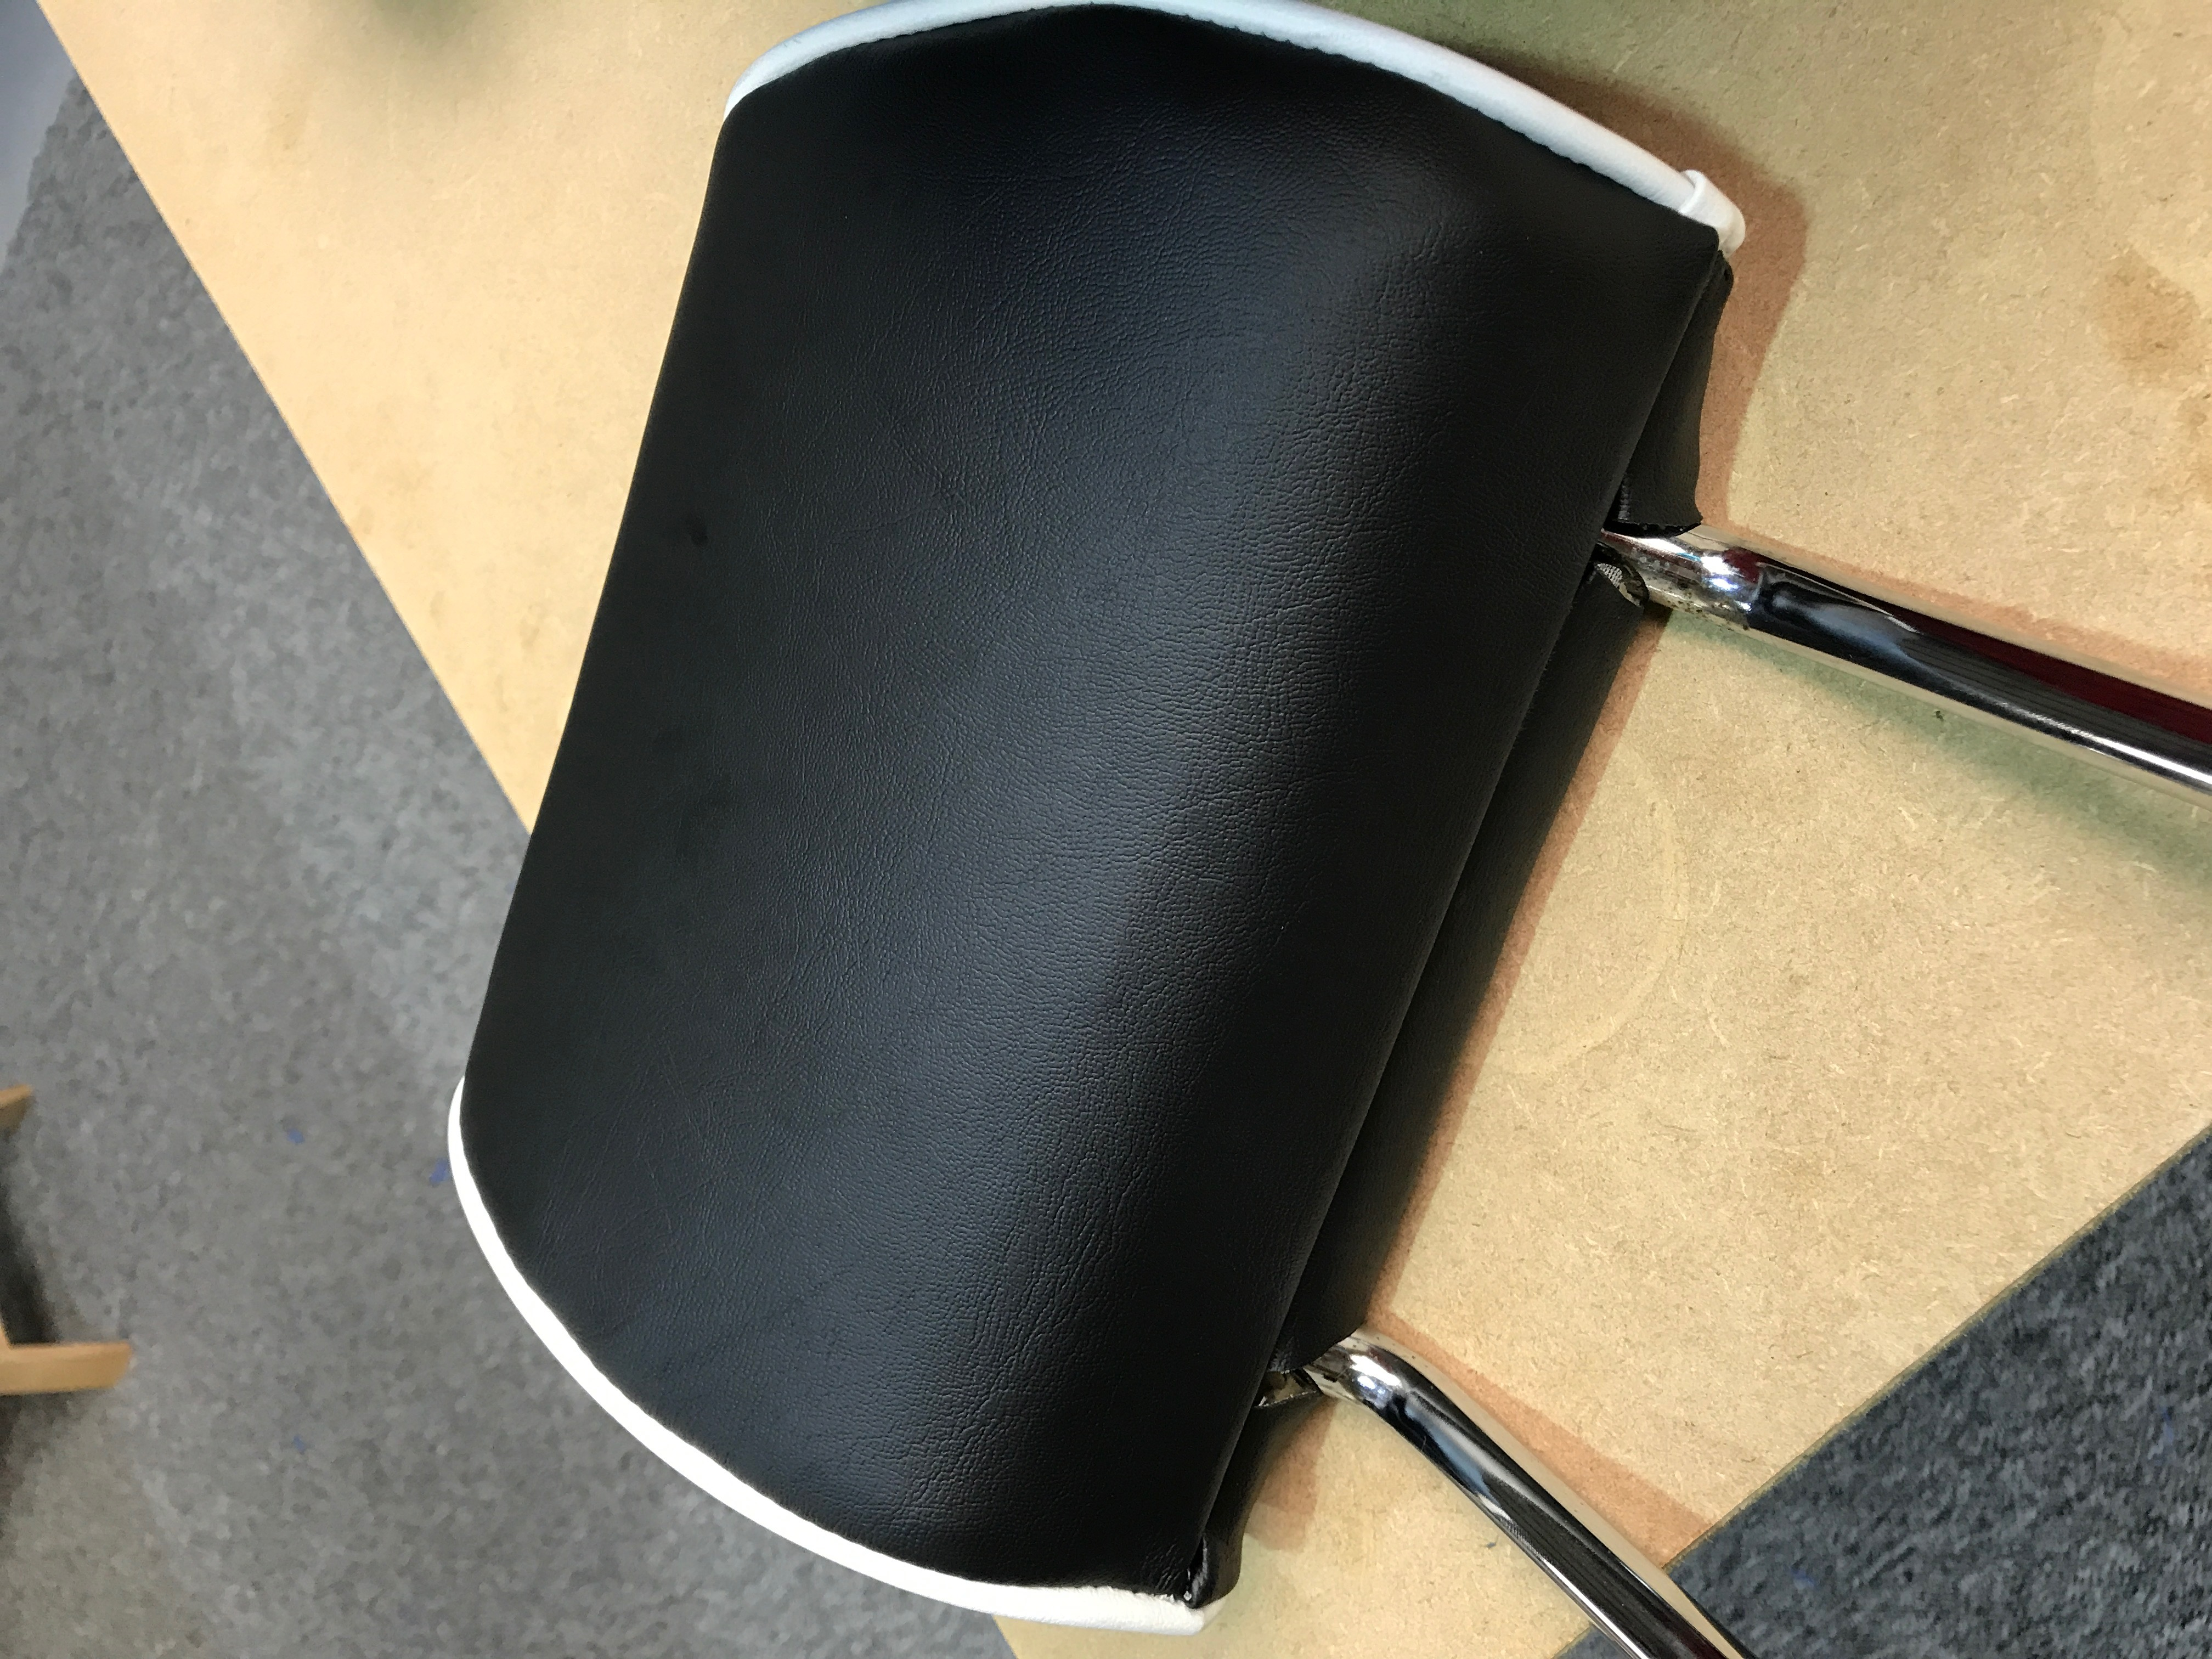 T4 headrest